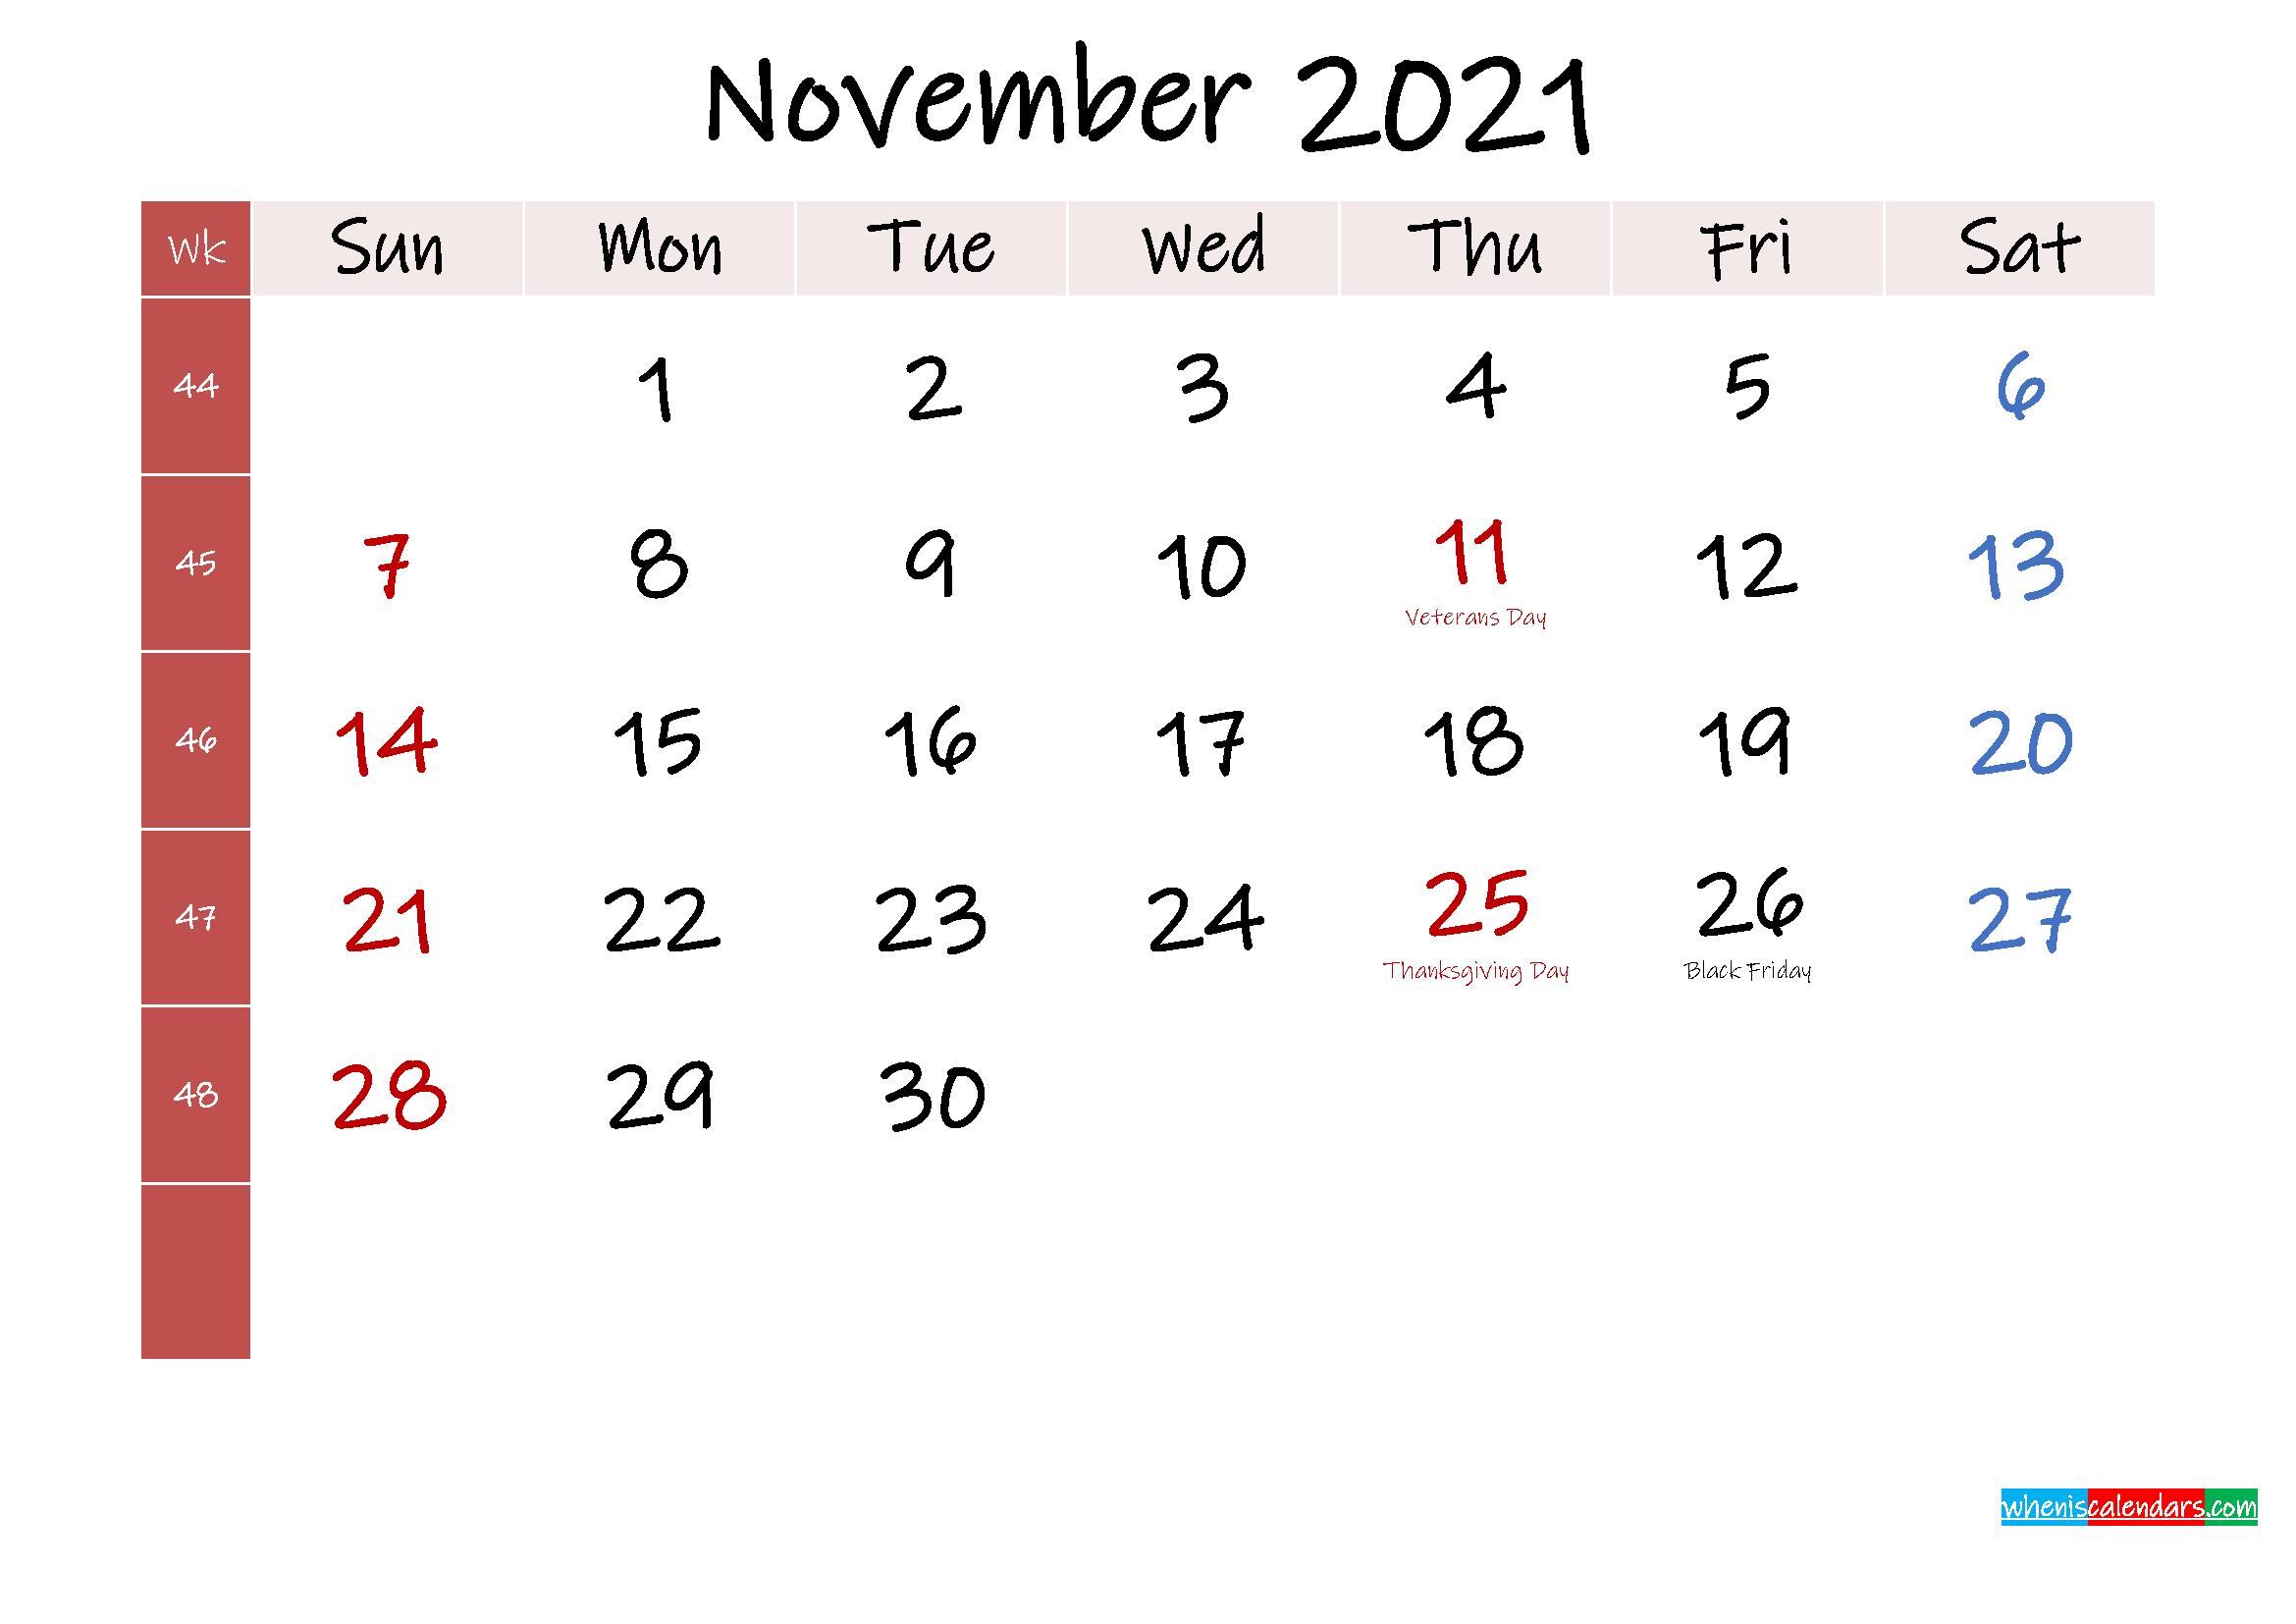 November 2021 Free Printable Calendar - Template No.ink21M371